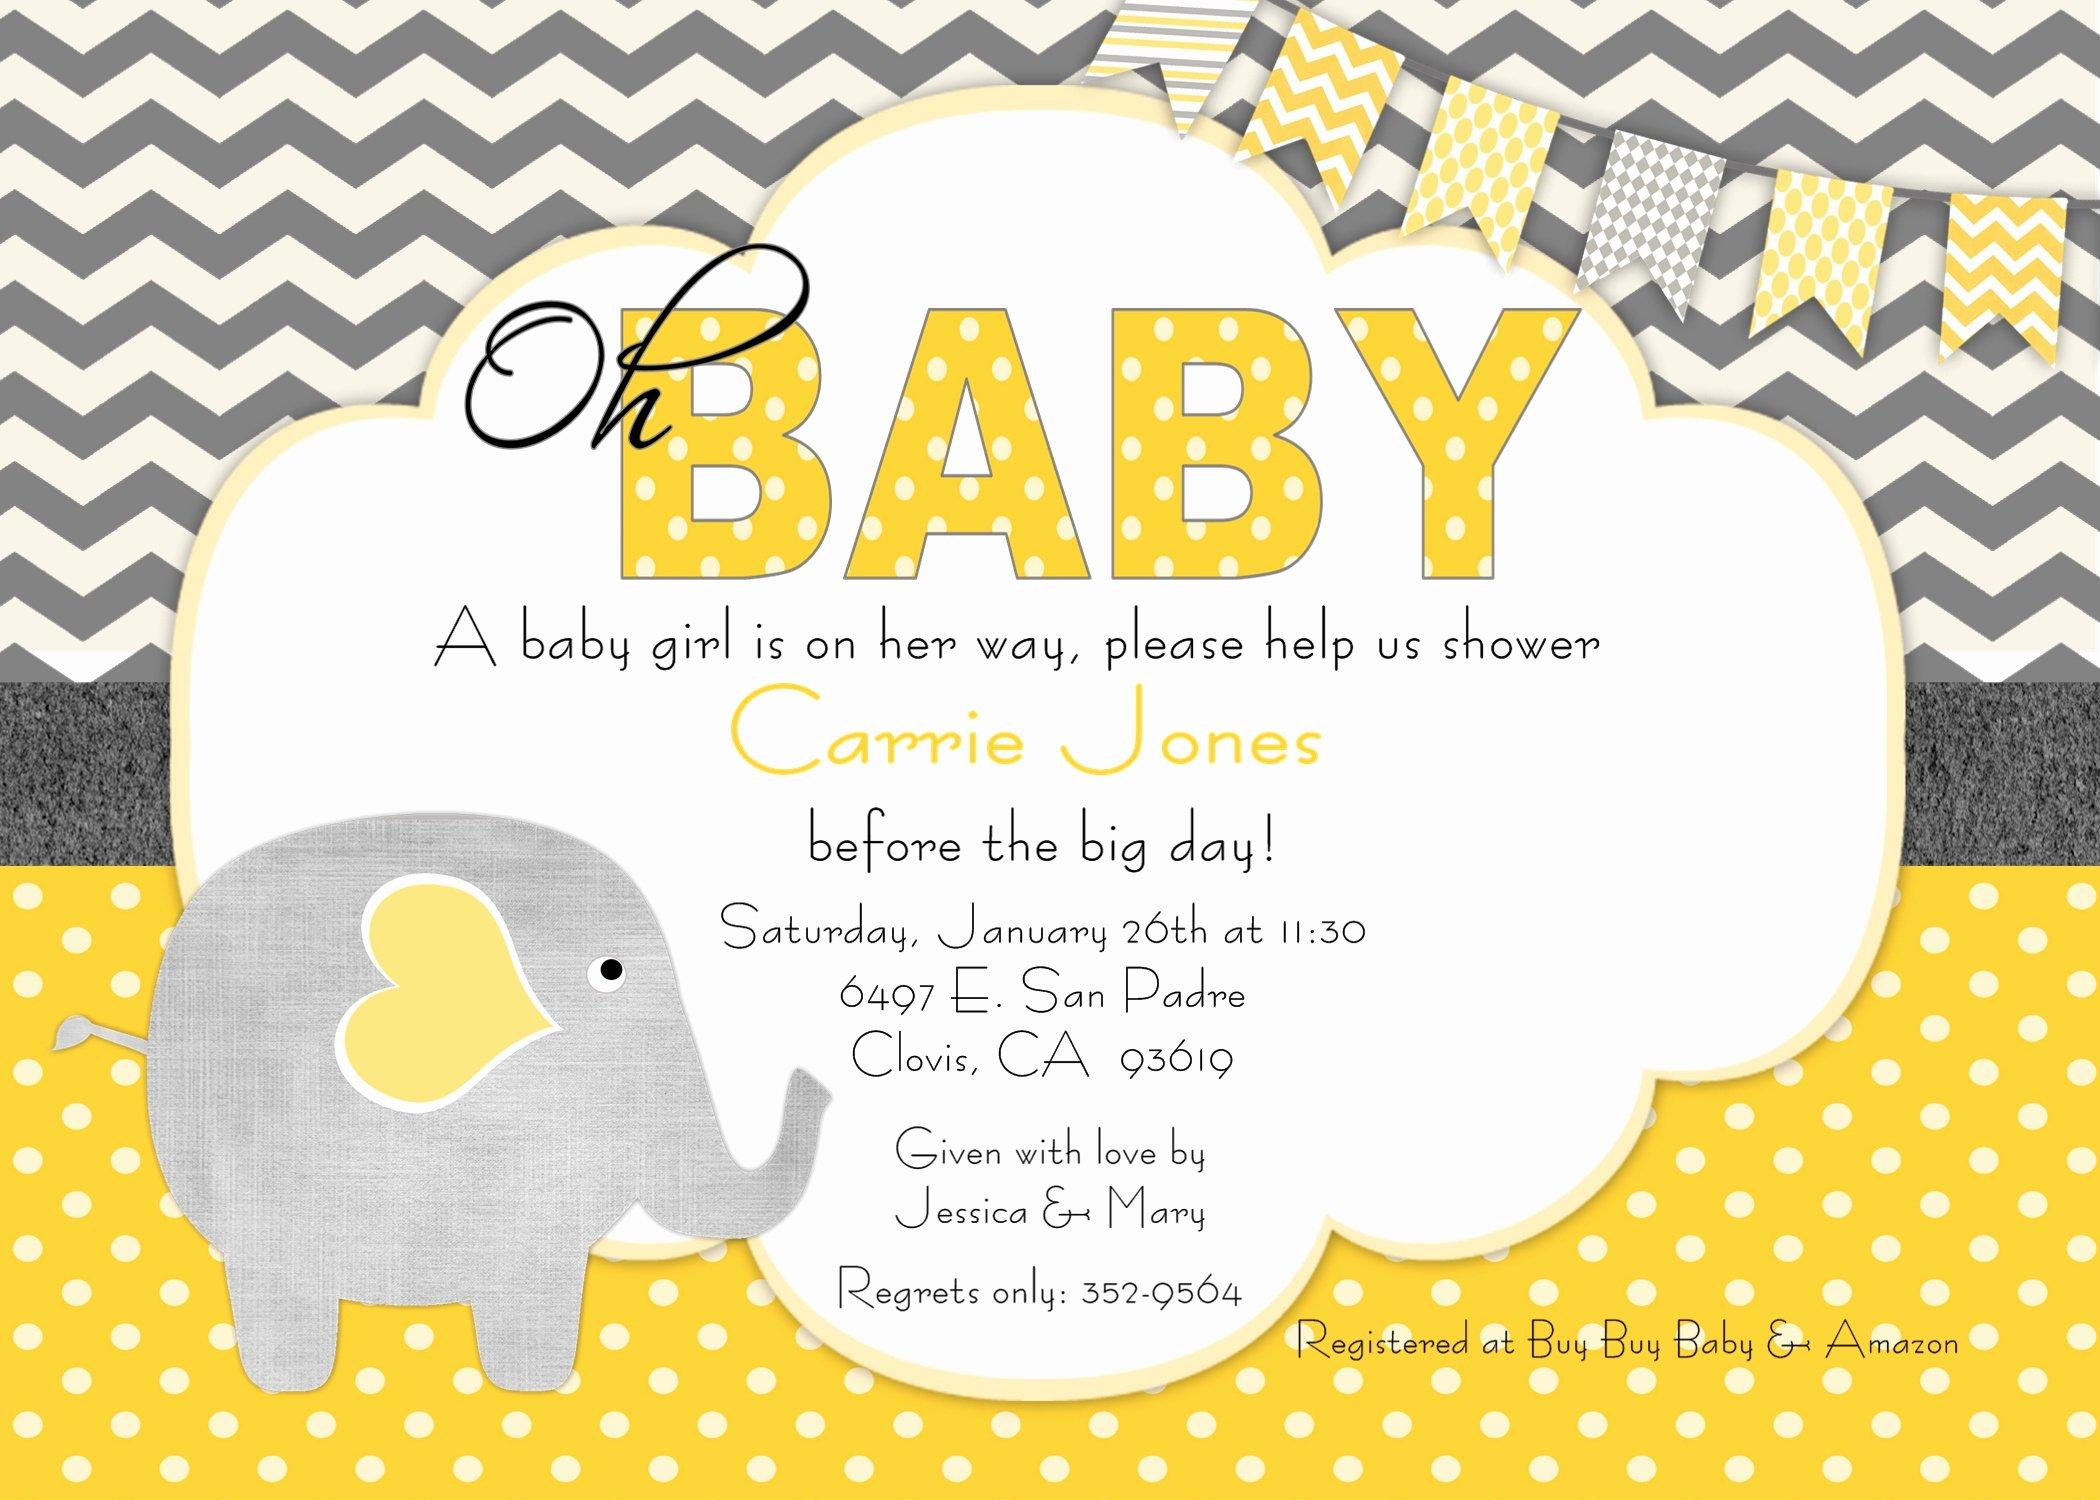 Baby Shower Invite Template Lovely Baby Shower Invitation